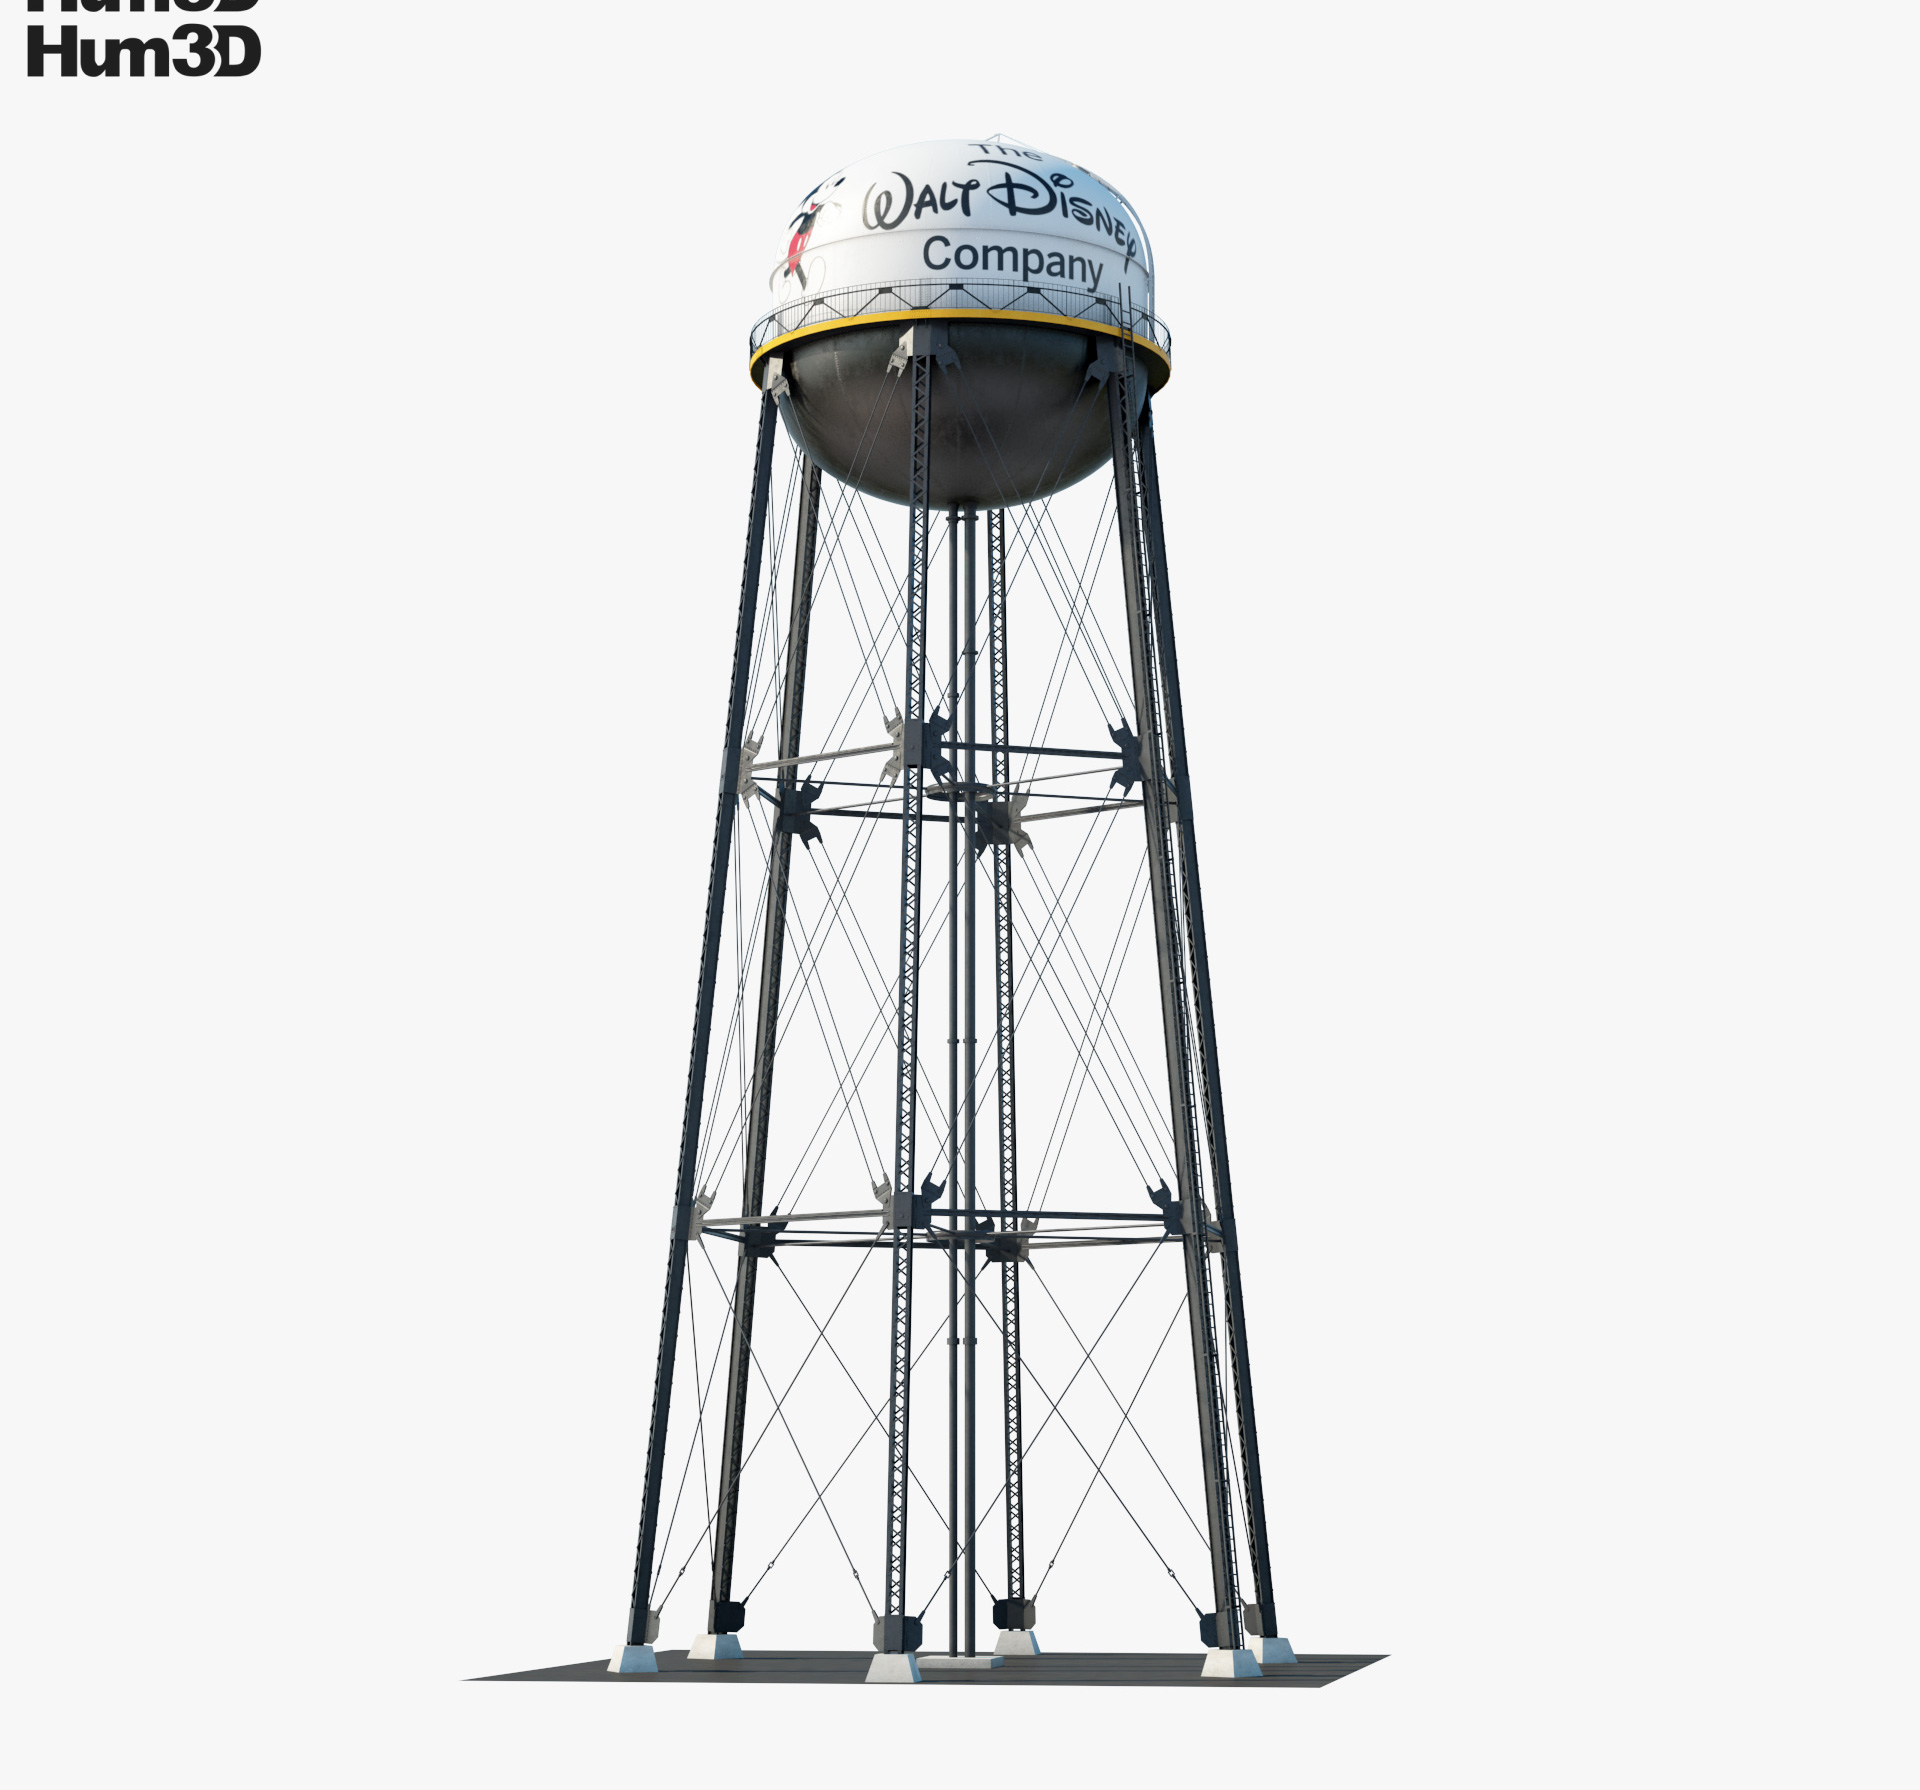 Walt Disney Studios Water Tower 3d model